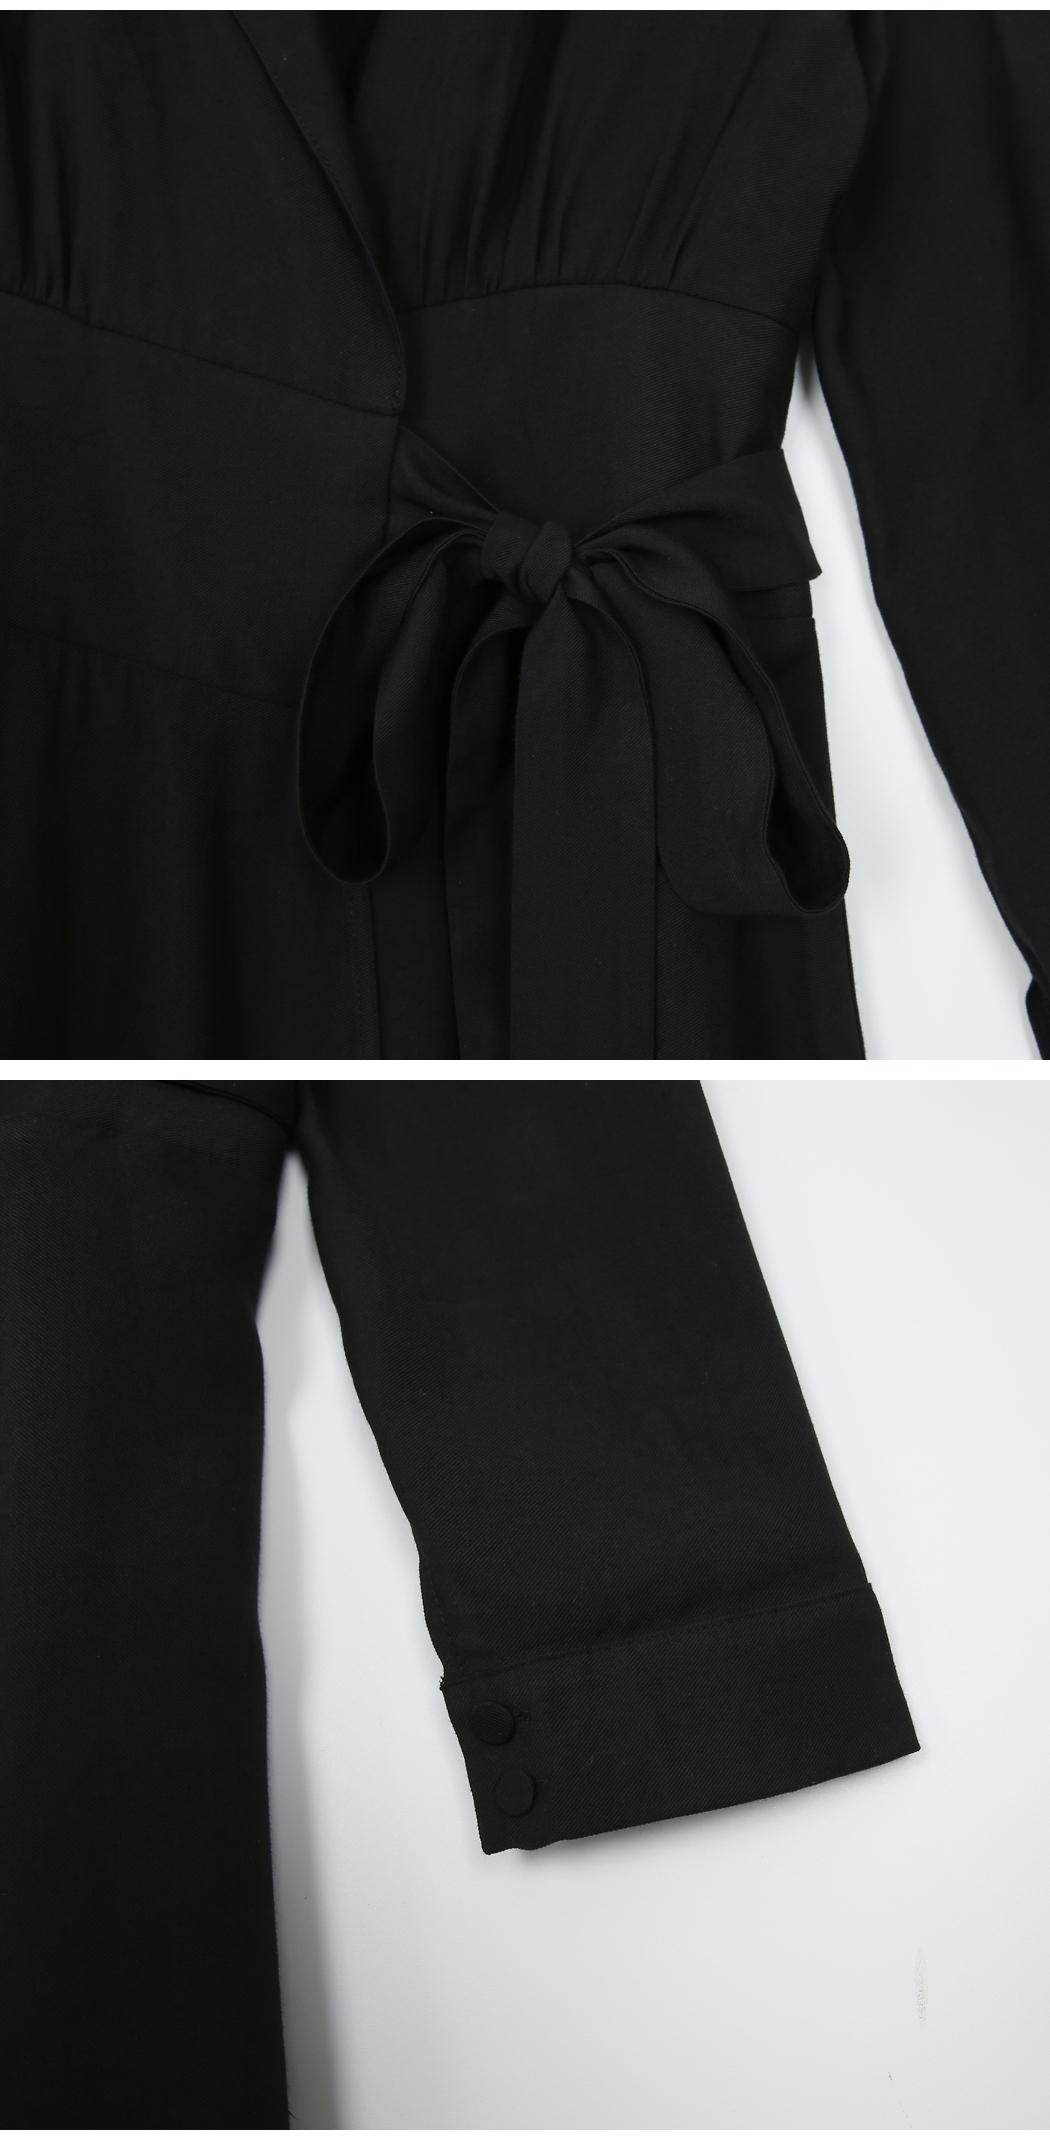 My-littleclassic / Dressy-Lab dress